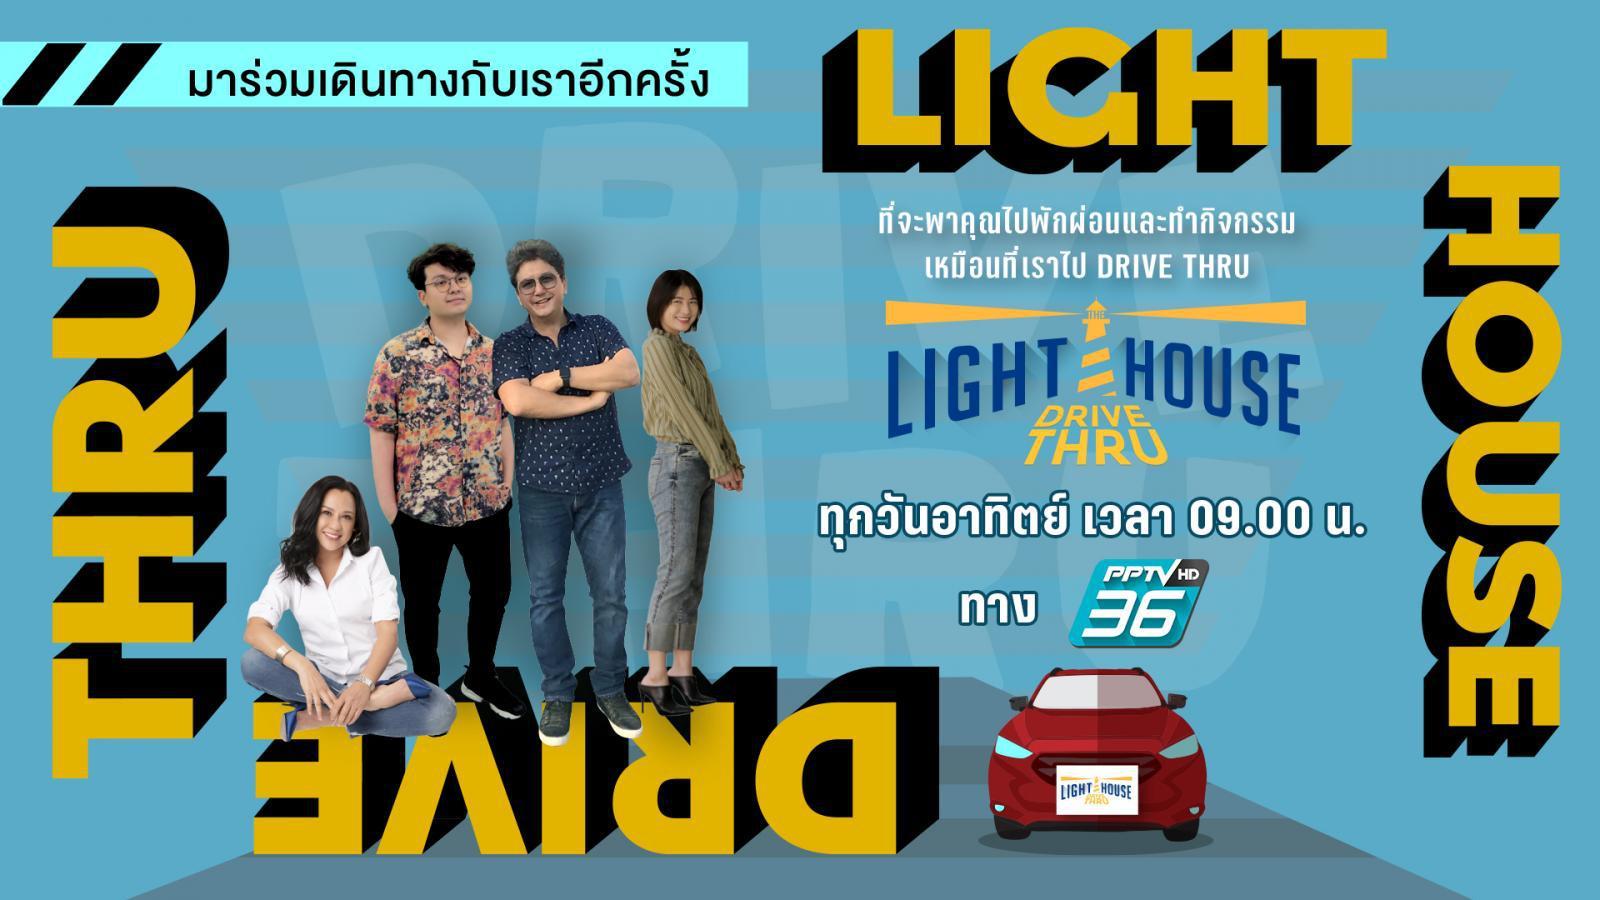 The Lighthouse Drive Thru